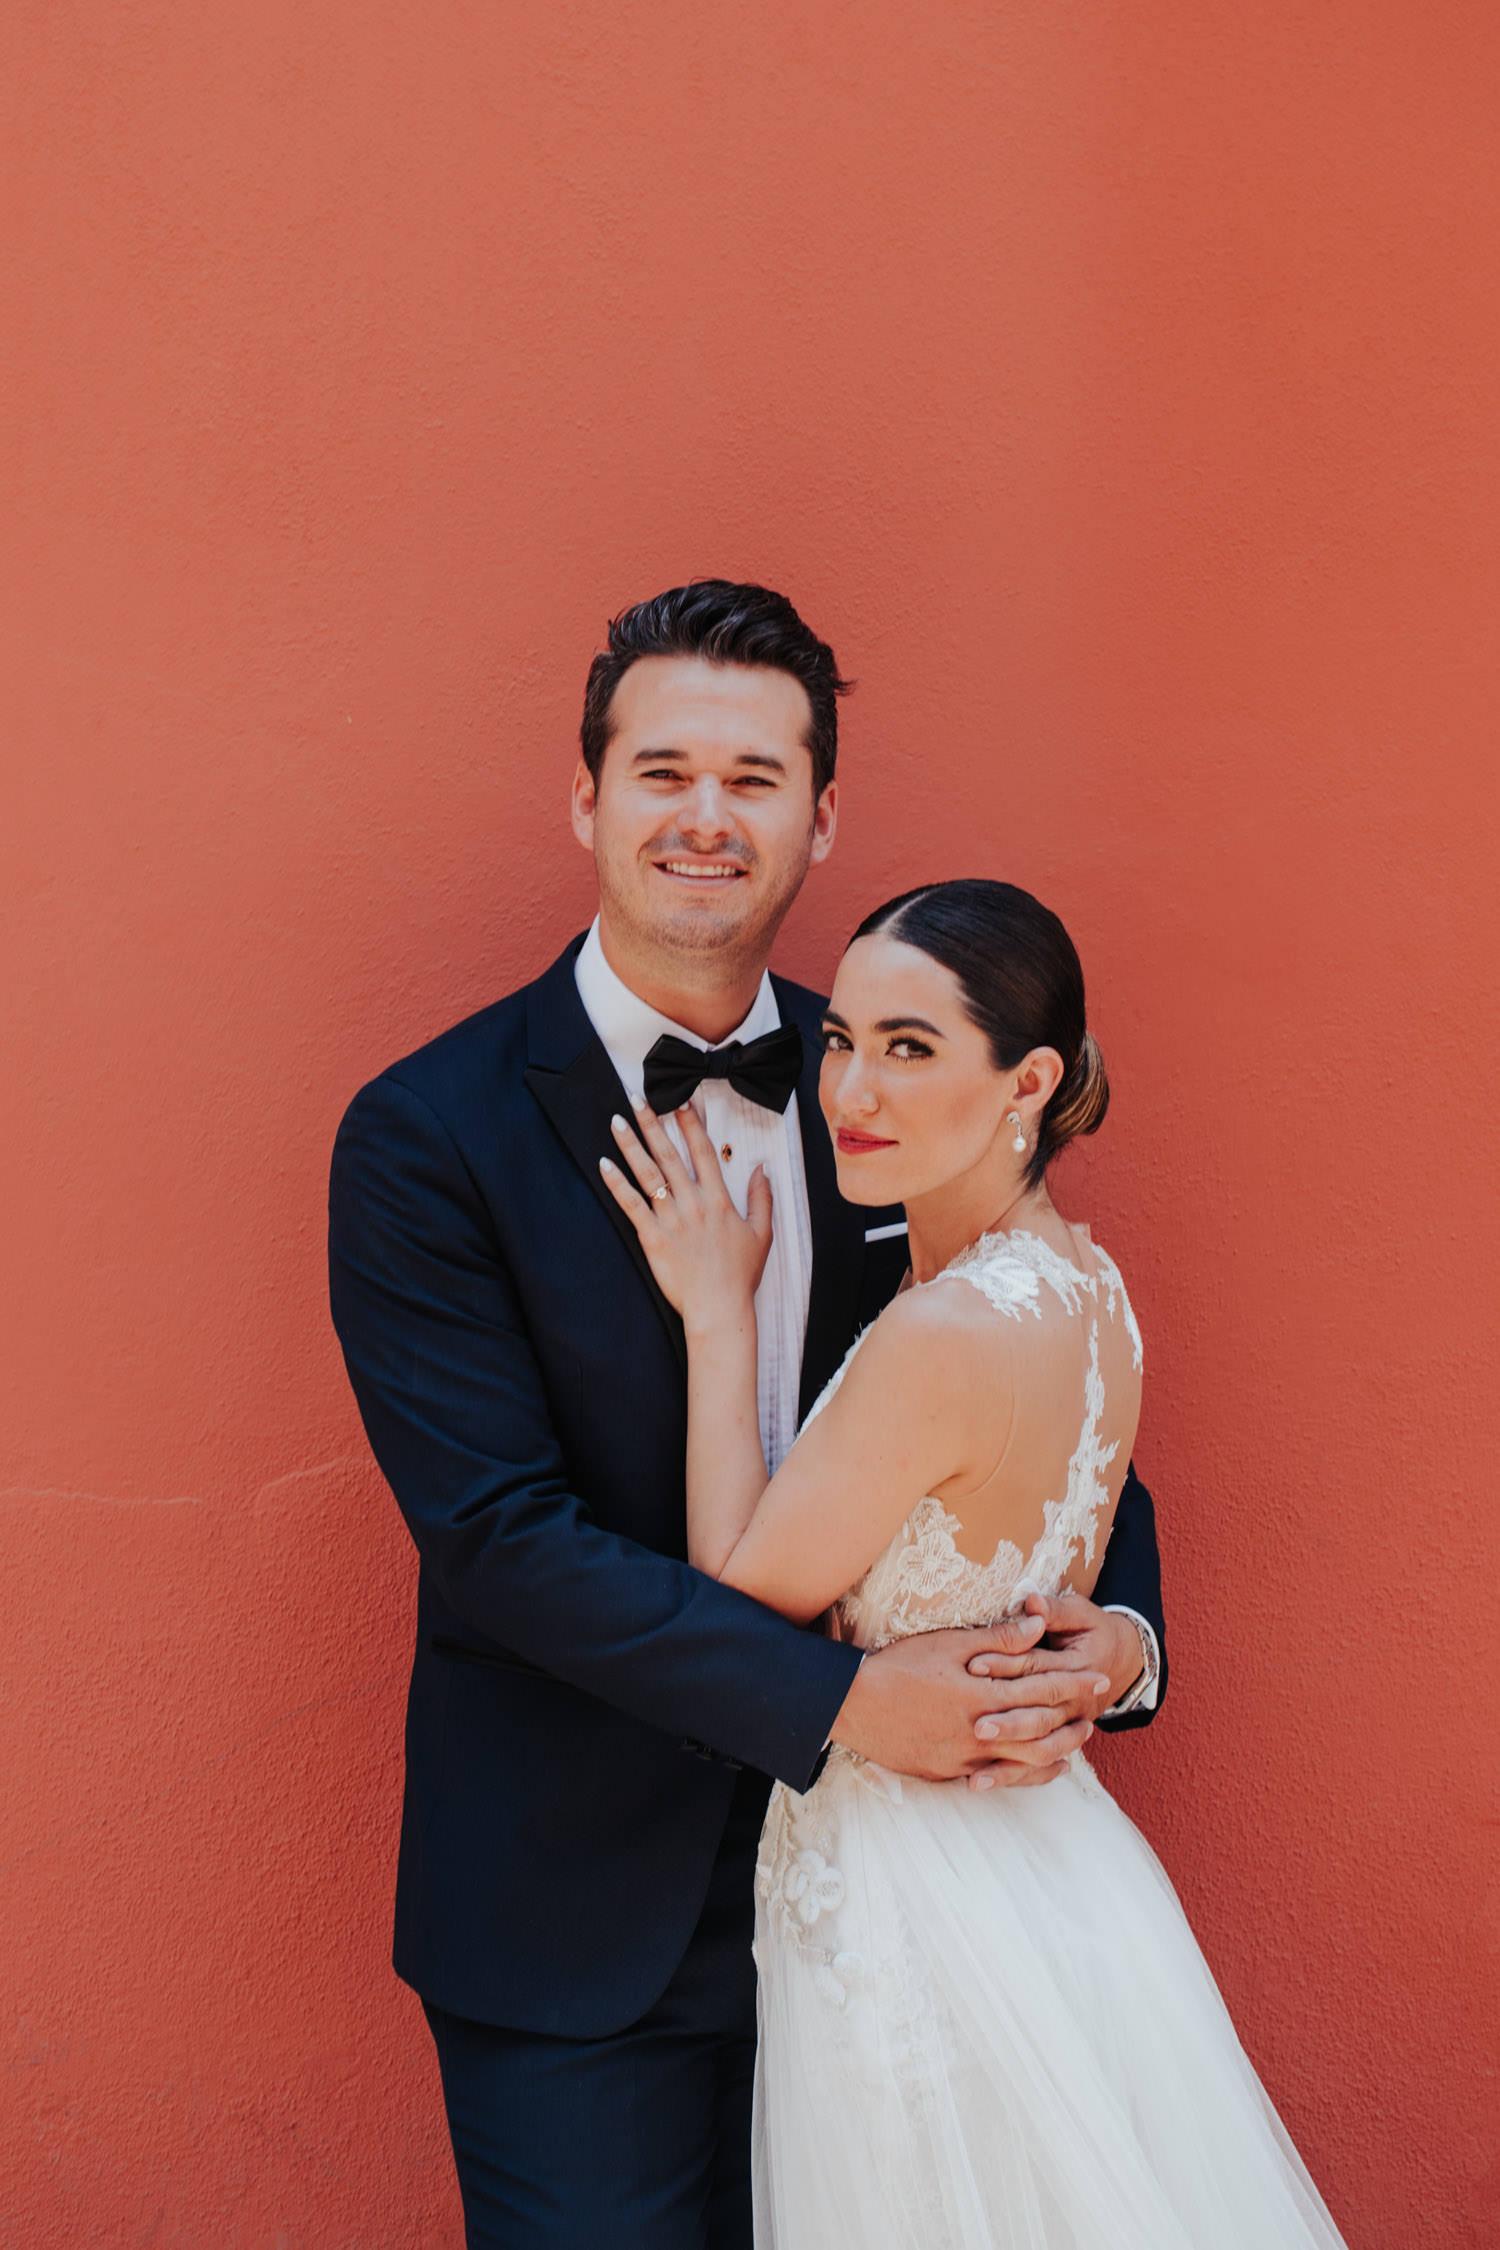 San-Miguel-de-Allende-Wedding-Photography-Parroquia-Instituto-Boda-Fotografia-Fer-Sergio-Pierce-Lifestyle-Photography0131.JPG